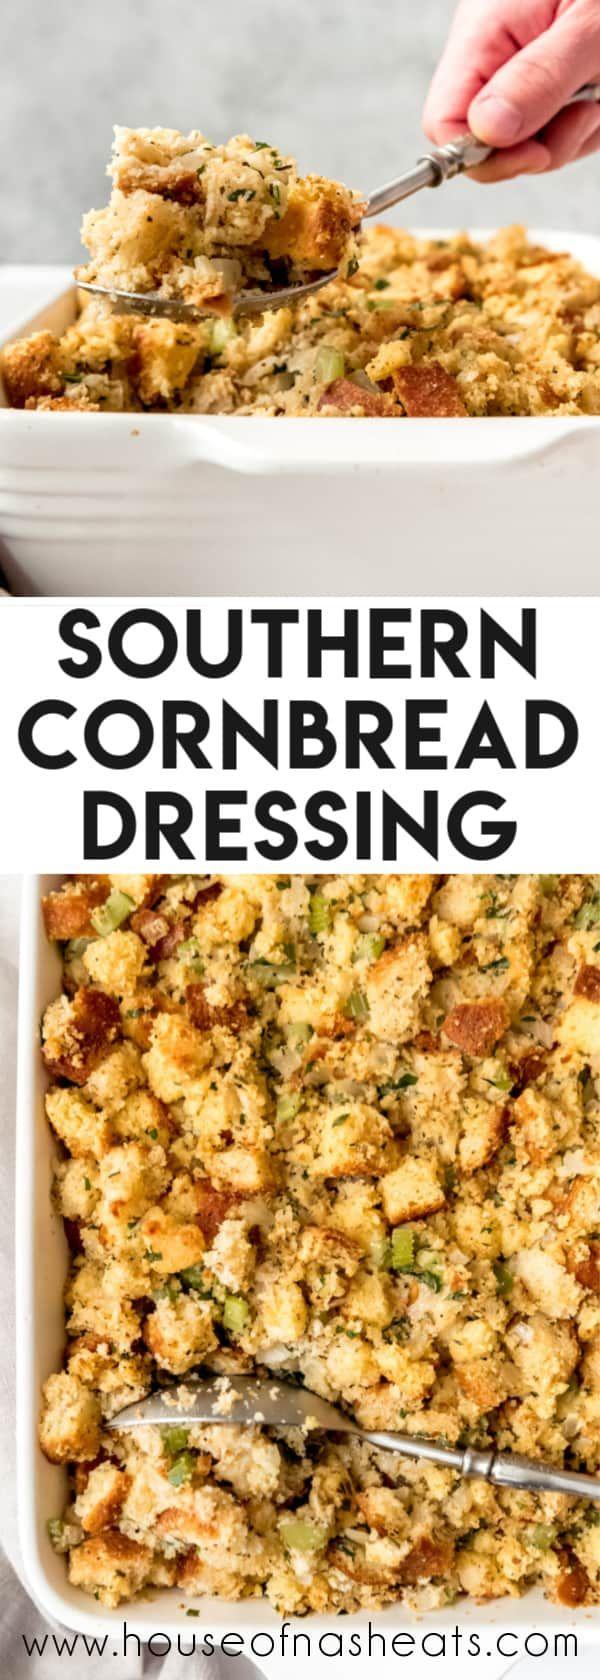 Easy Southern Cornbread Dressing #cornbreaddressing